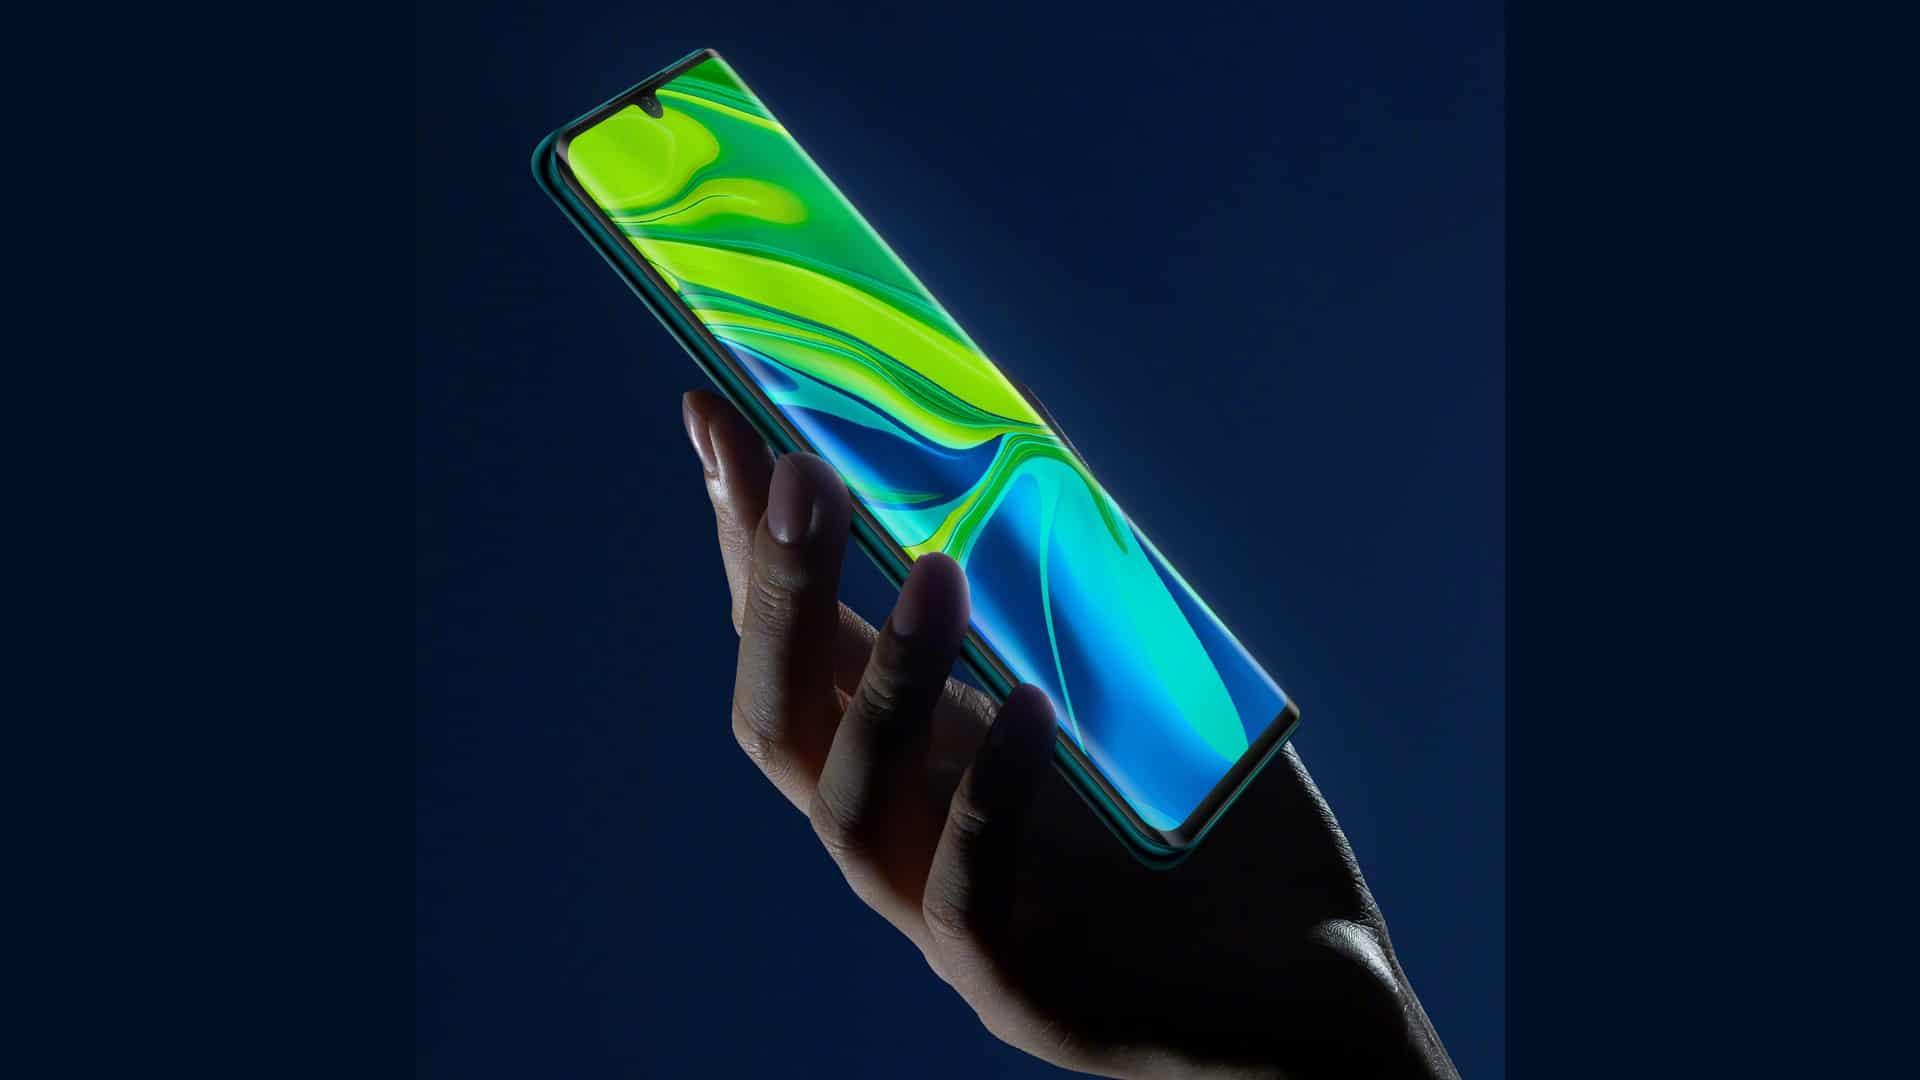 58304 Xiaomi Mi CC9 Pro Will Feature 30W Charging & 5,260mAh Battery